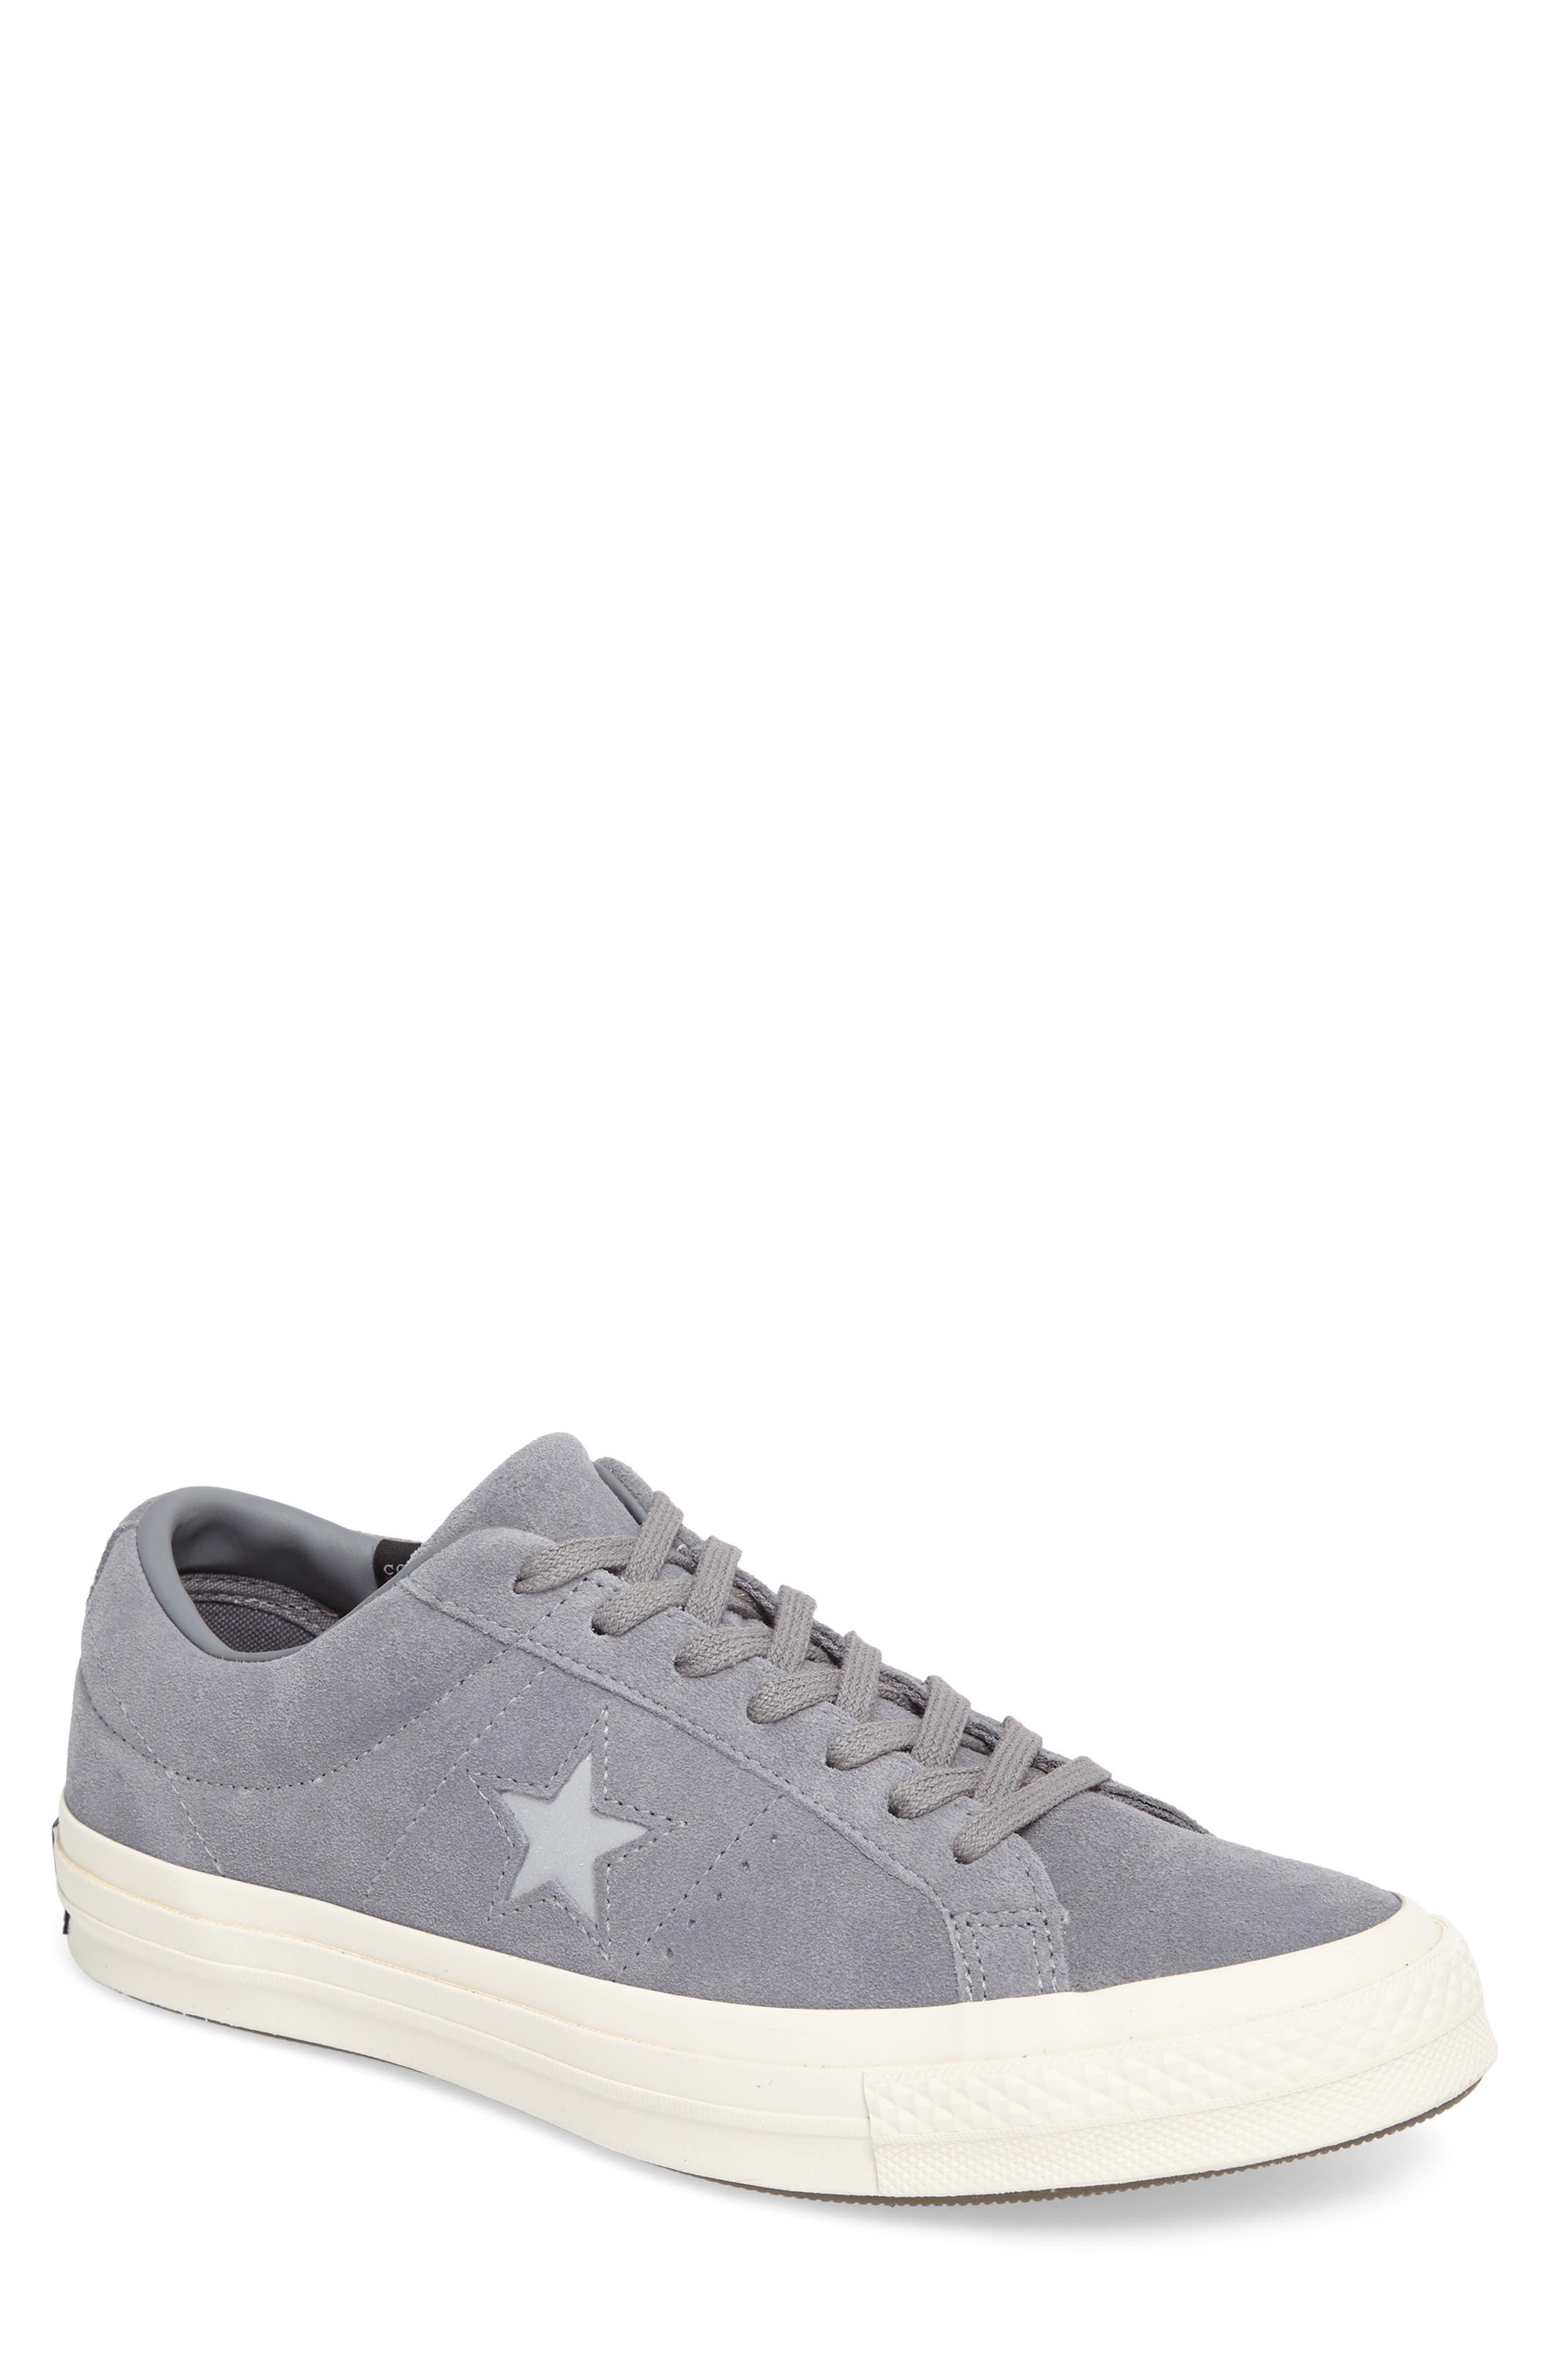 Alternate Image 1 Selected - Converse One Star Sneaker (Men)